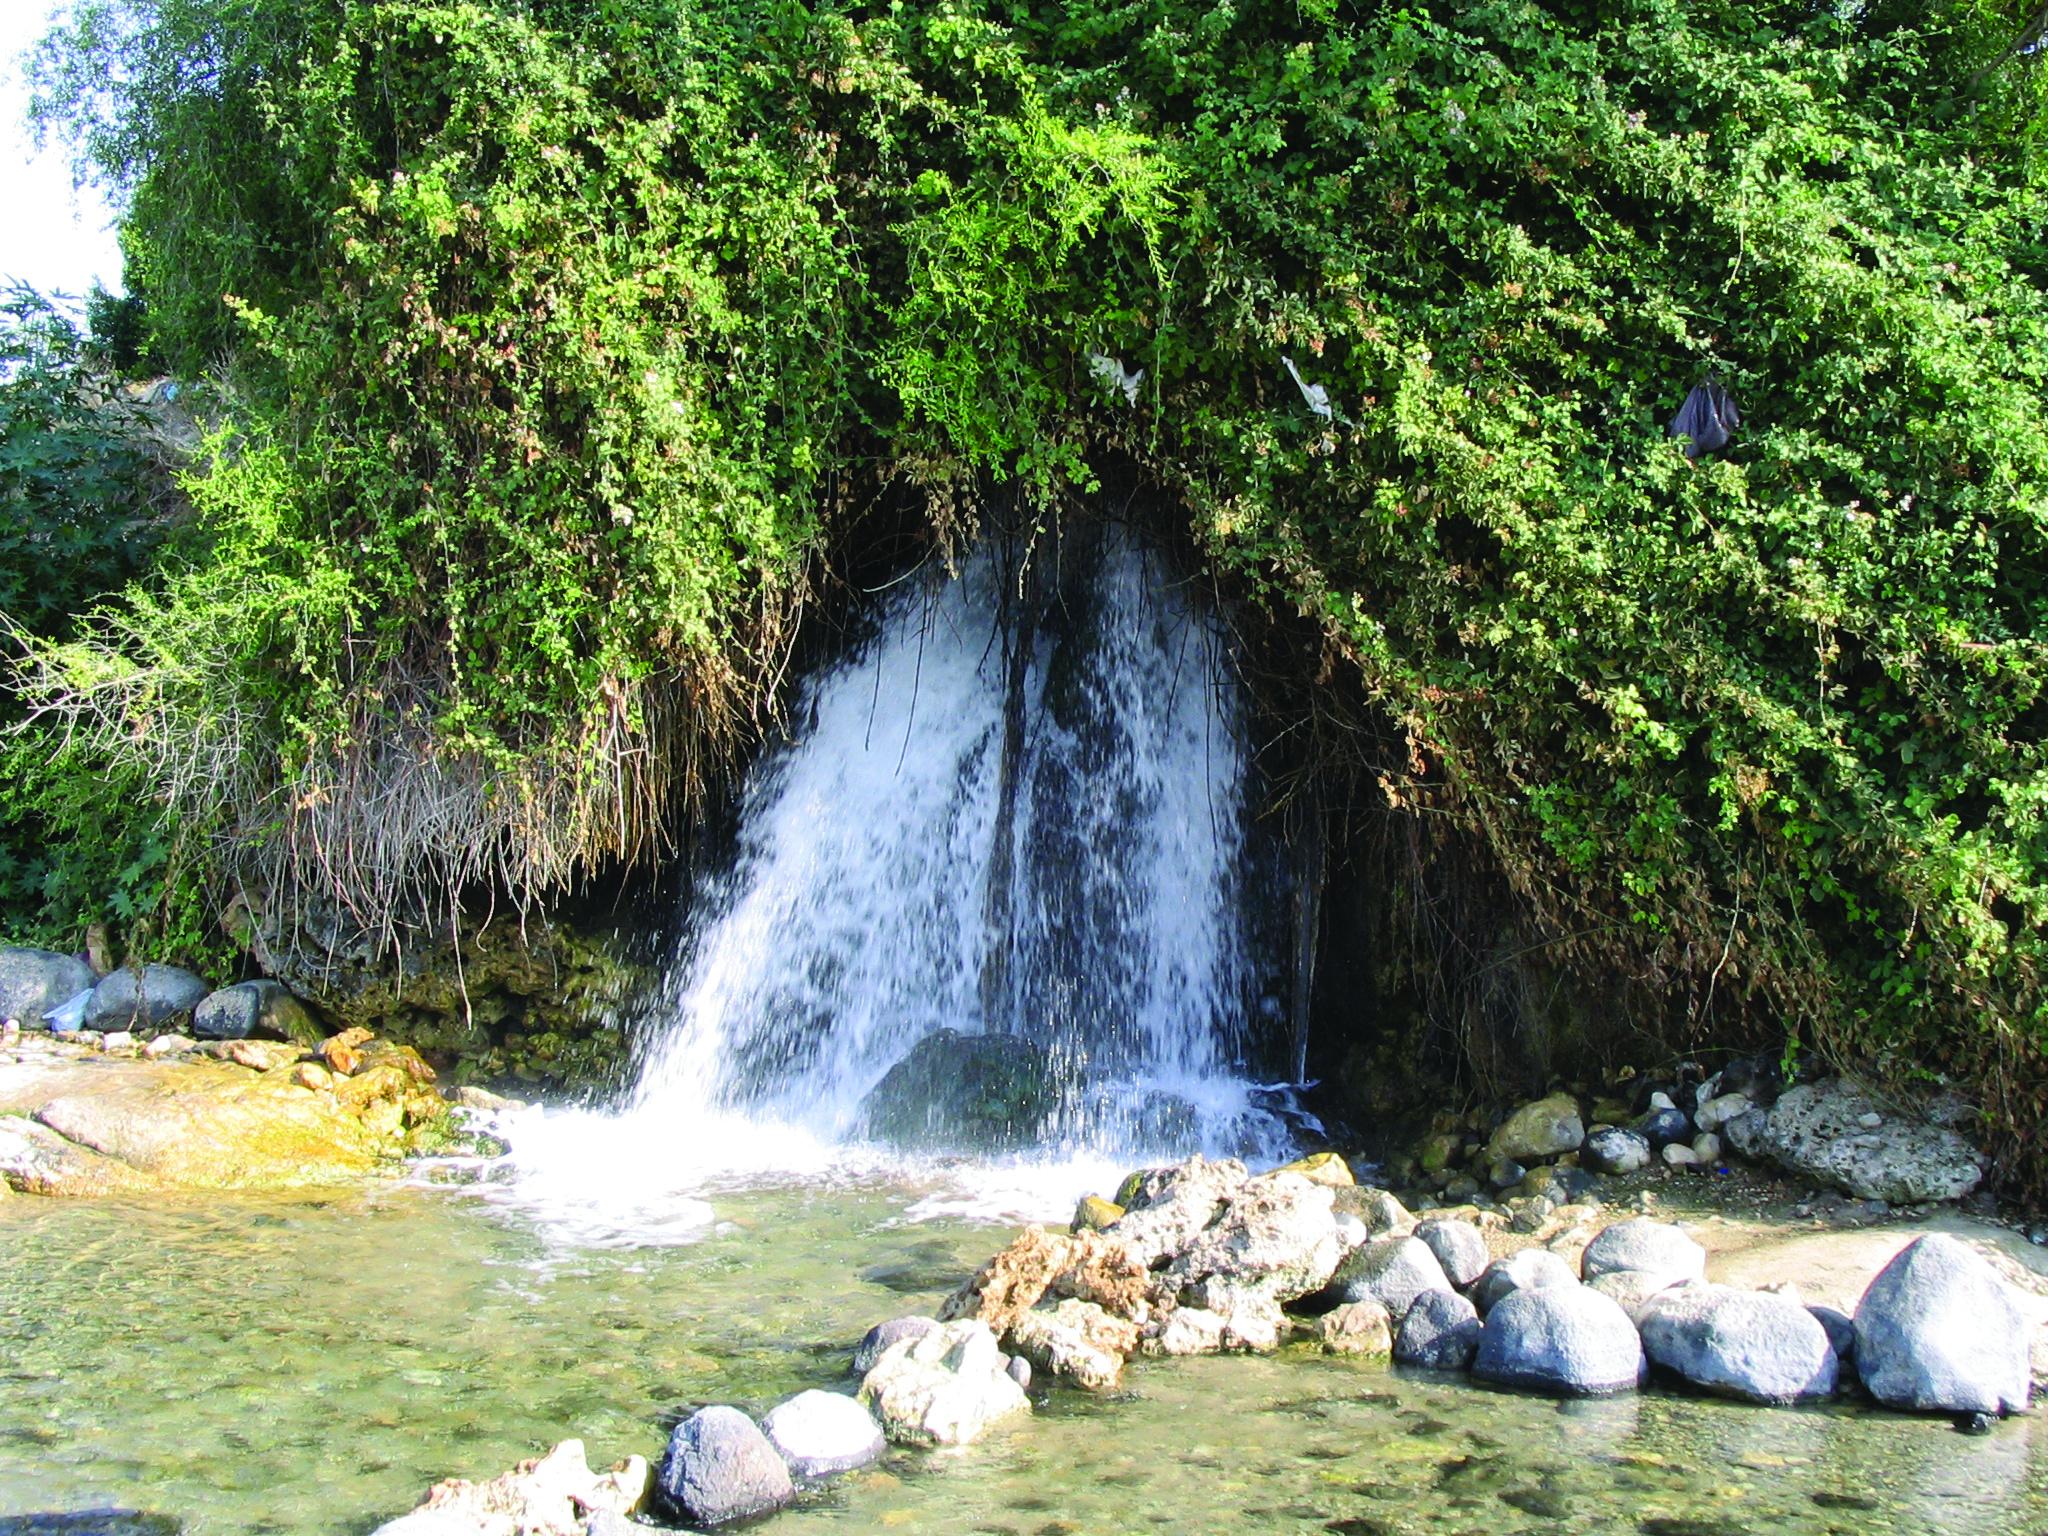 Small Waterfall In Israel